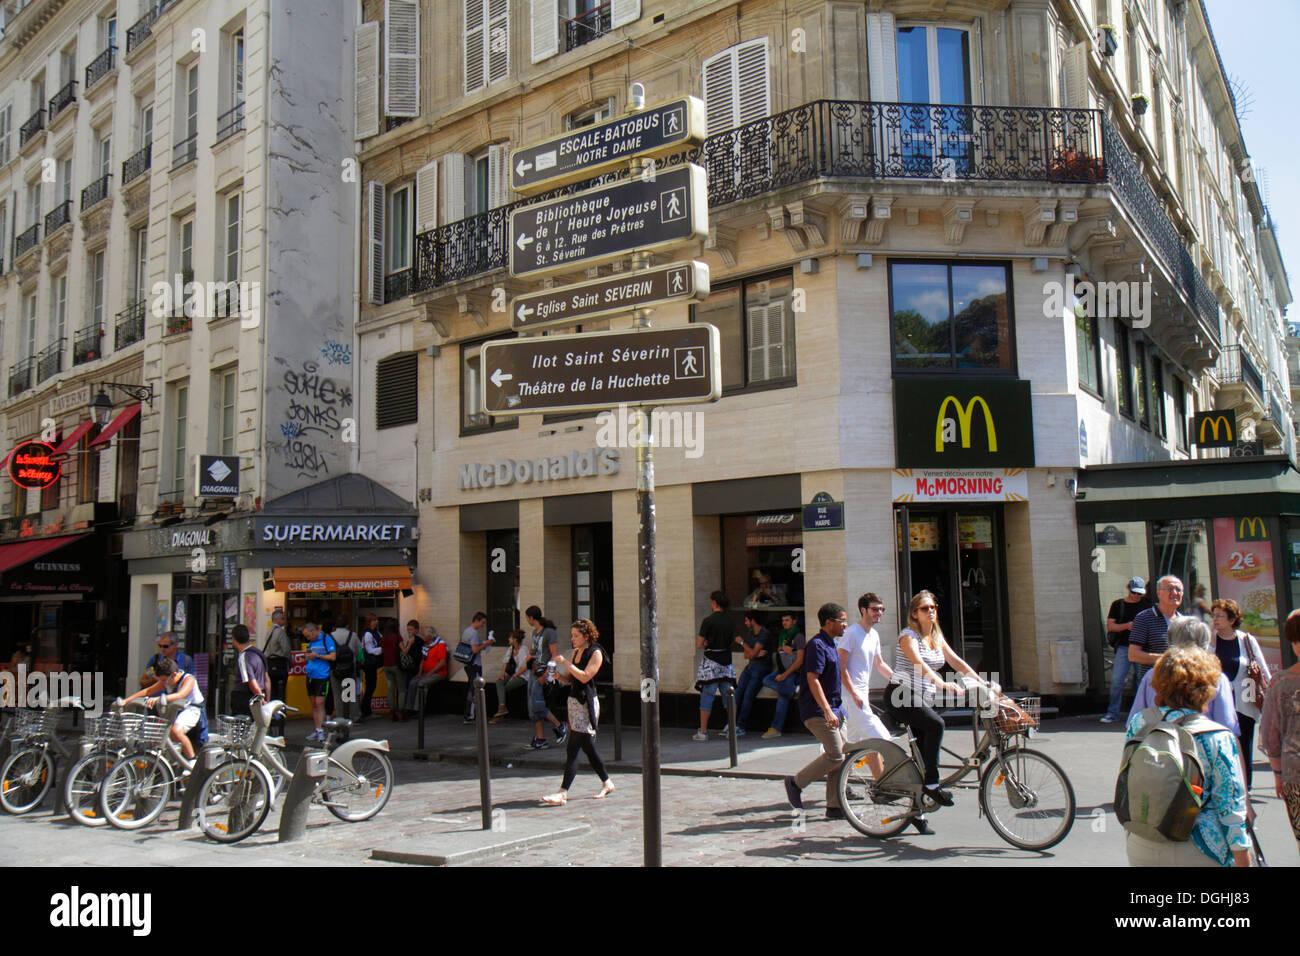 Paris France Europe French 5th arrondissement Latin Quarter Rive Gauche Left Bank Boulevard Saint-Germain McDonald's fast food r - Stock Image